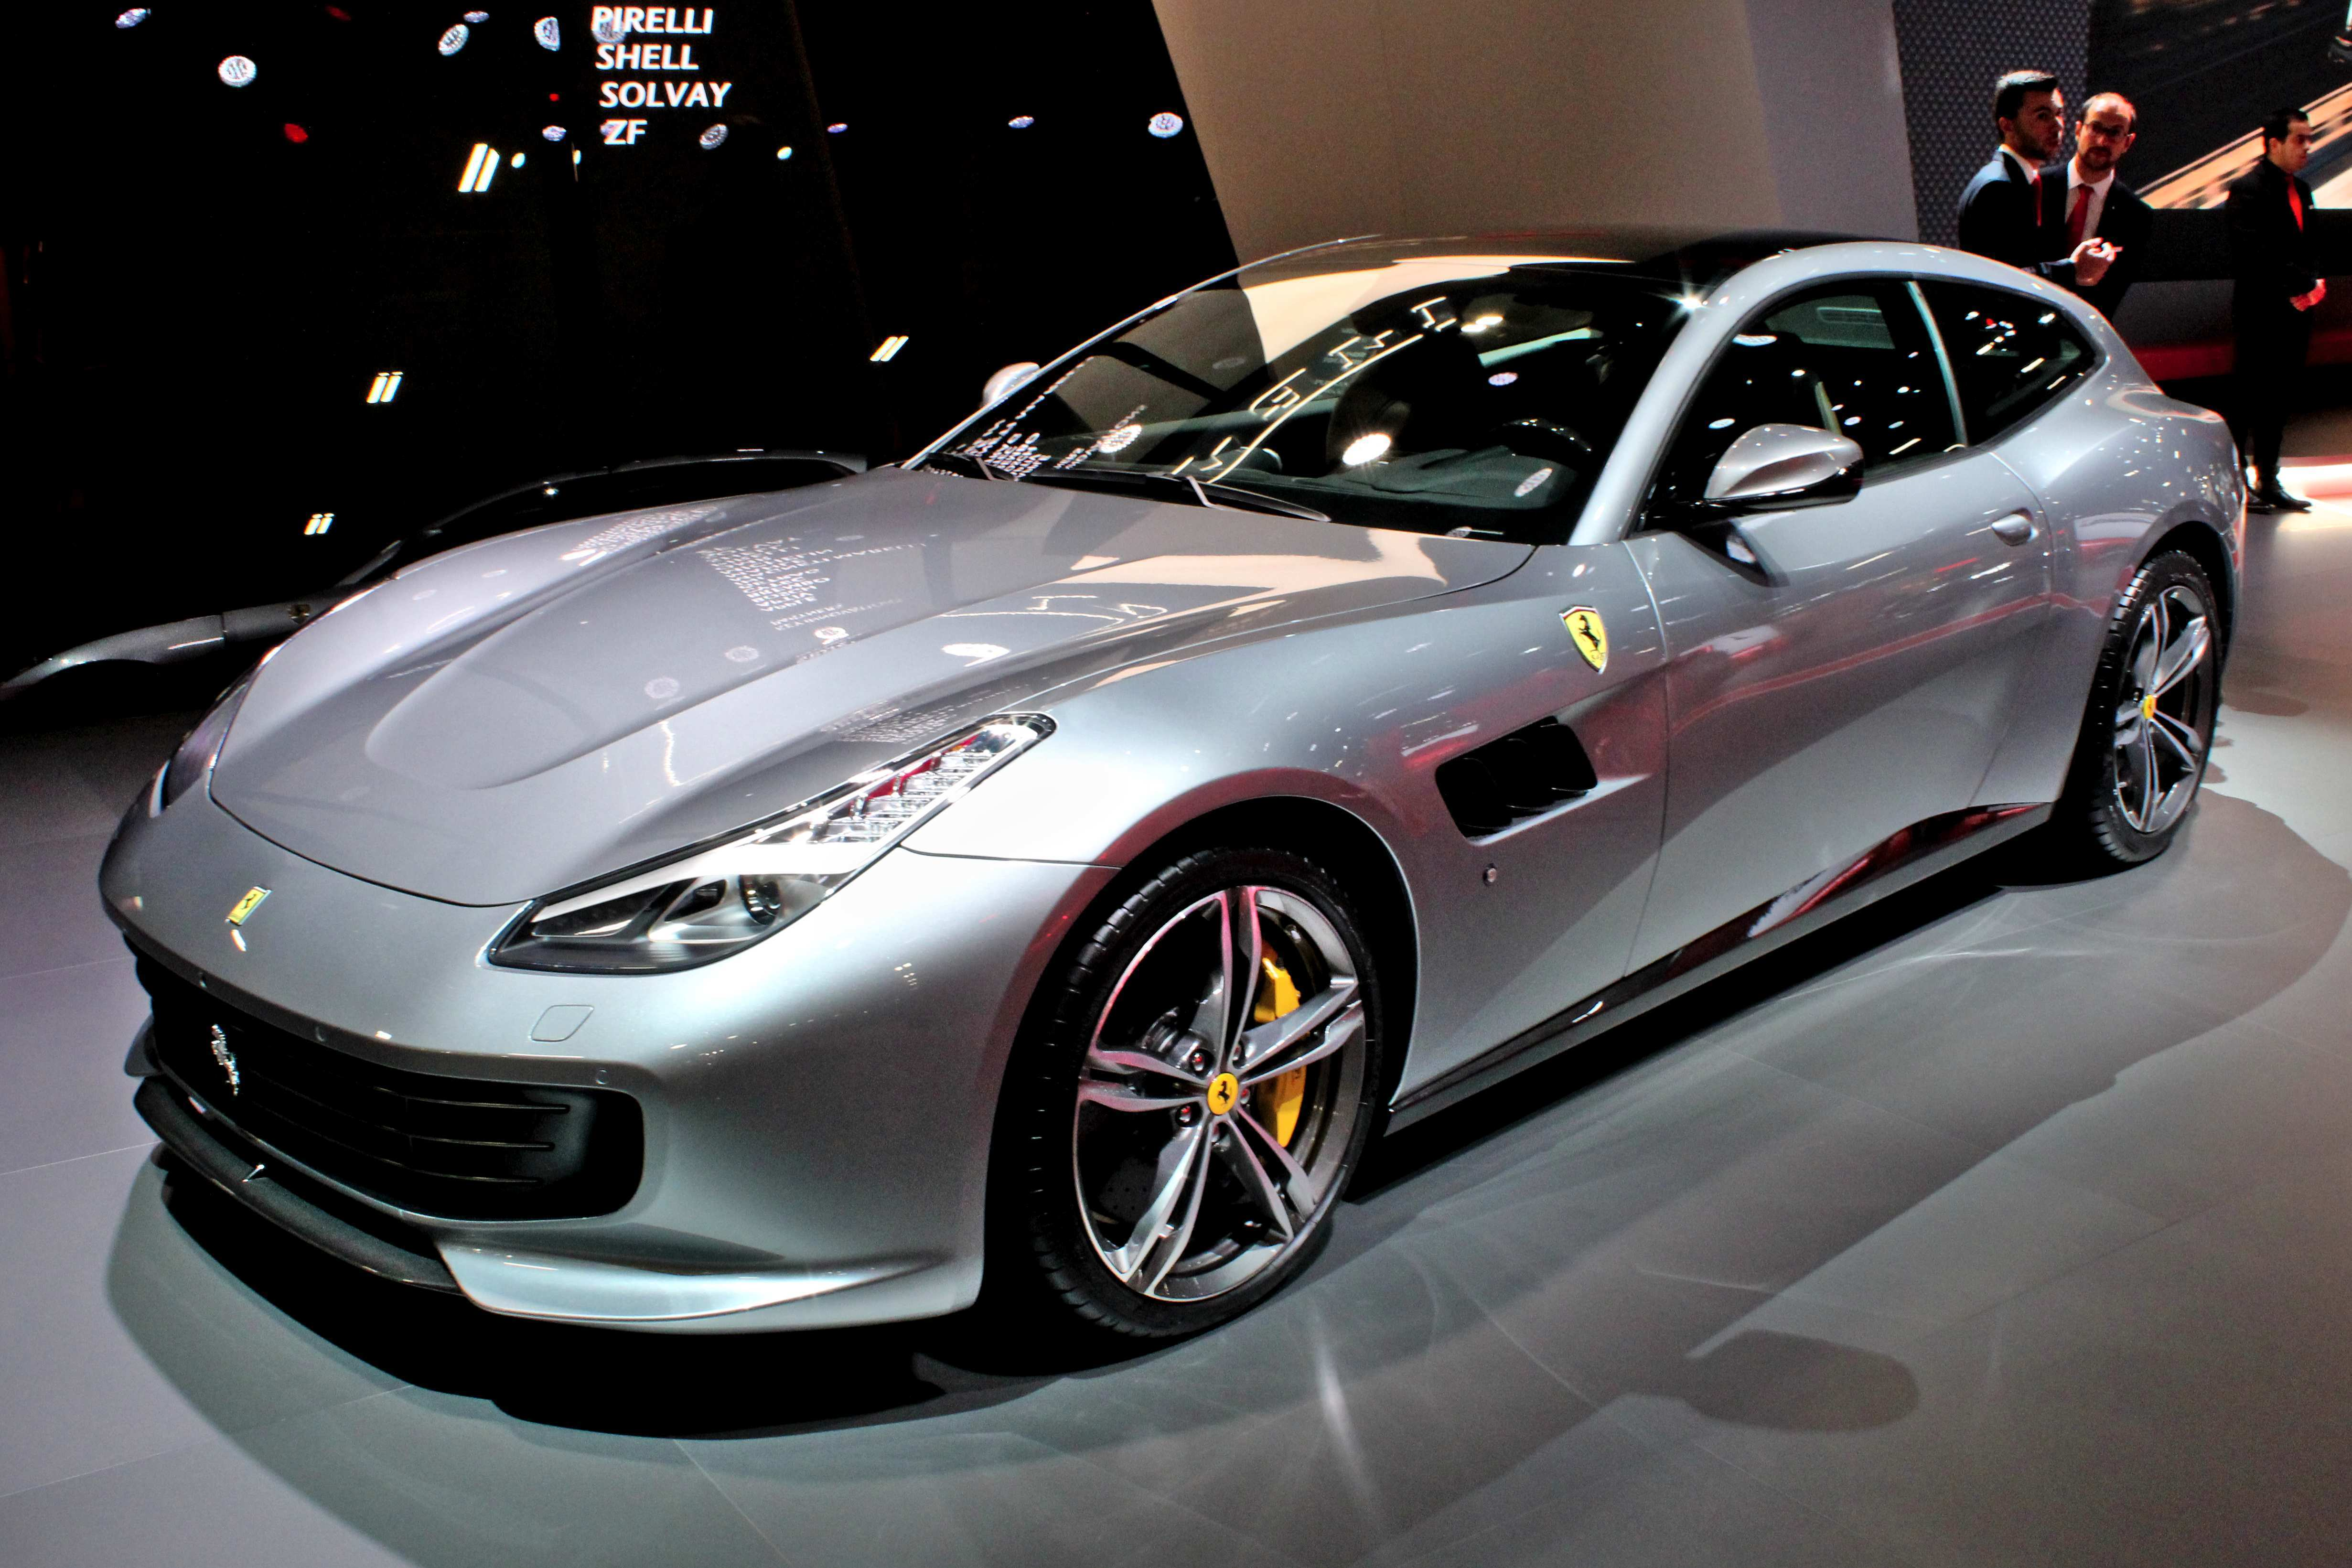 54 Concept of The Ferrari In Uscita 2019 Price Concept by The Ferrari In Uscita 2019 Price